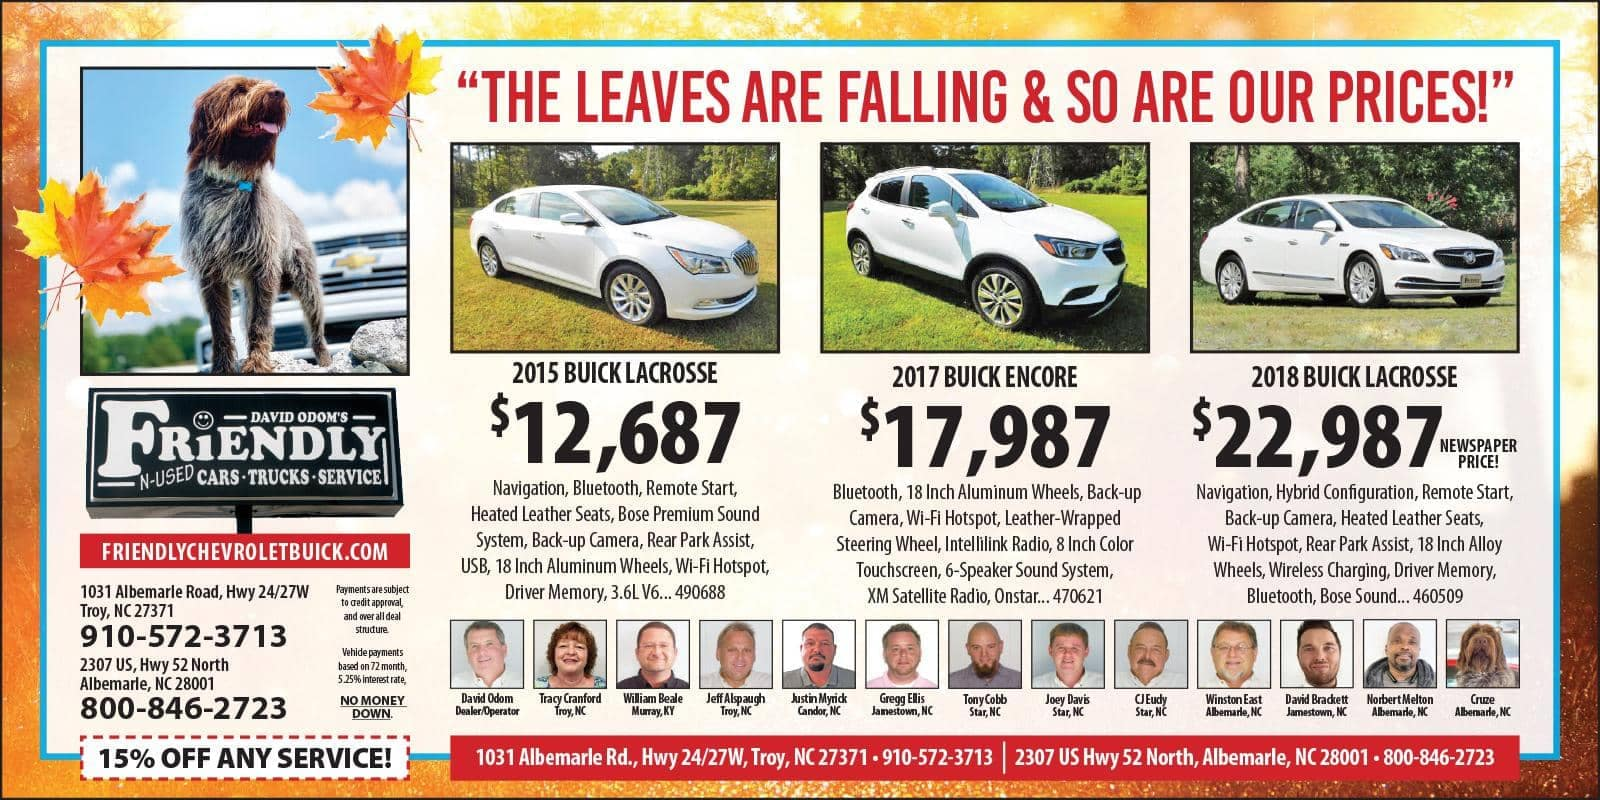 Friendly Chevy Buick Fall Savings